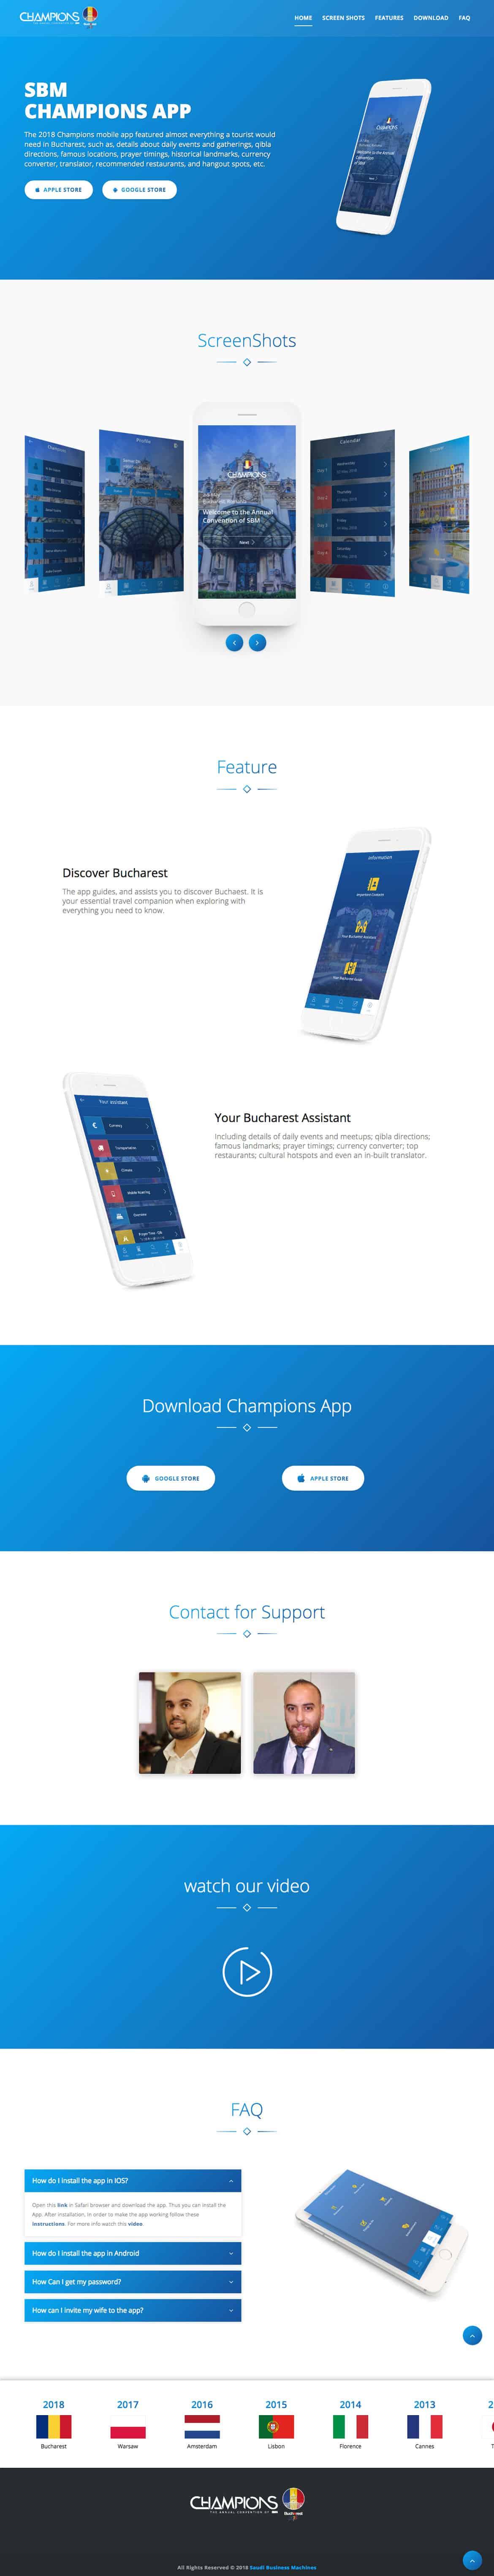 Champions-App-Landing-Page